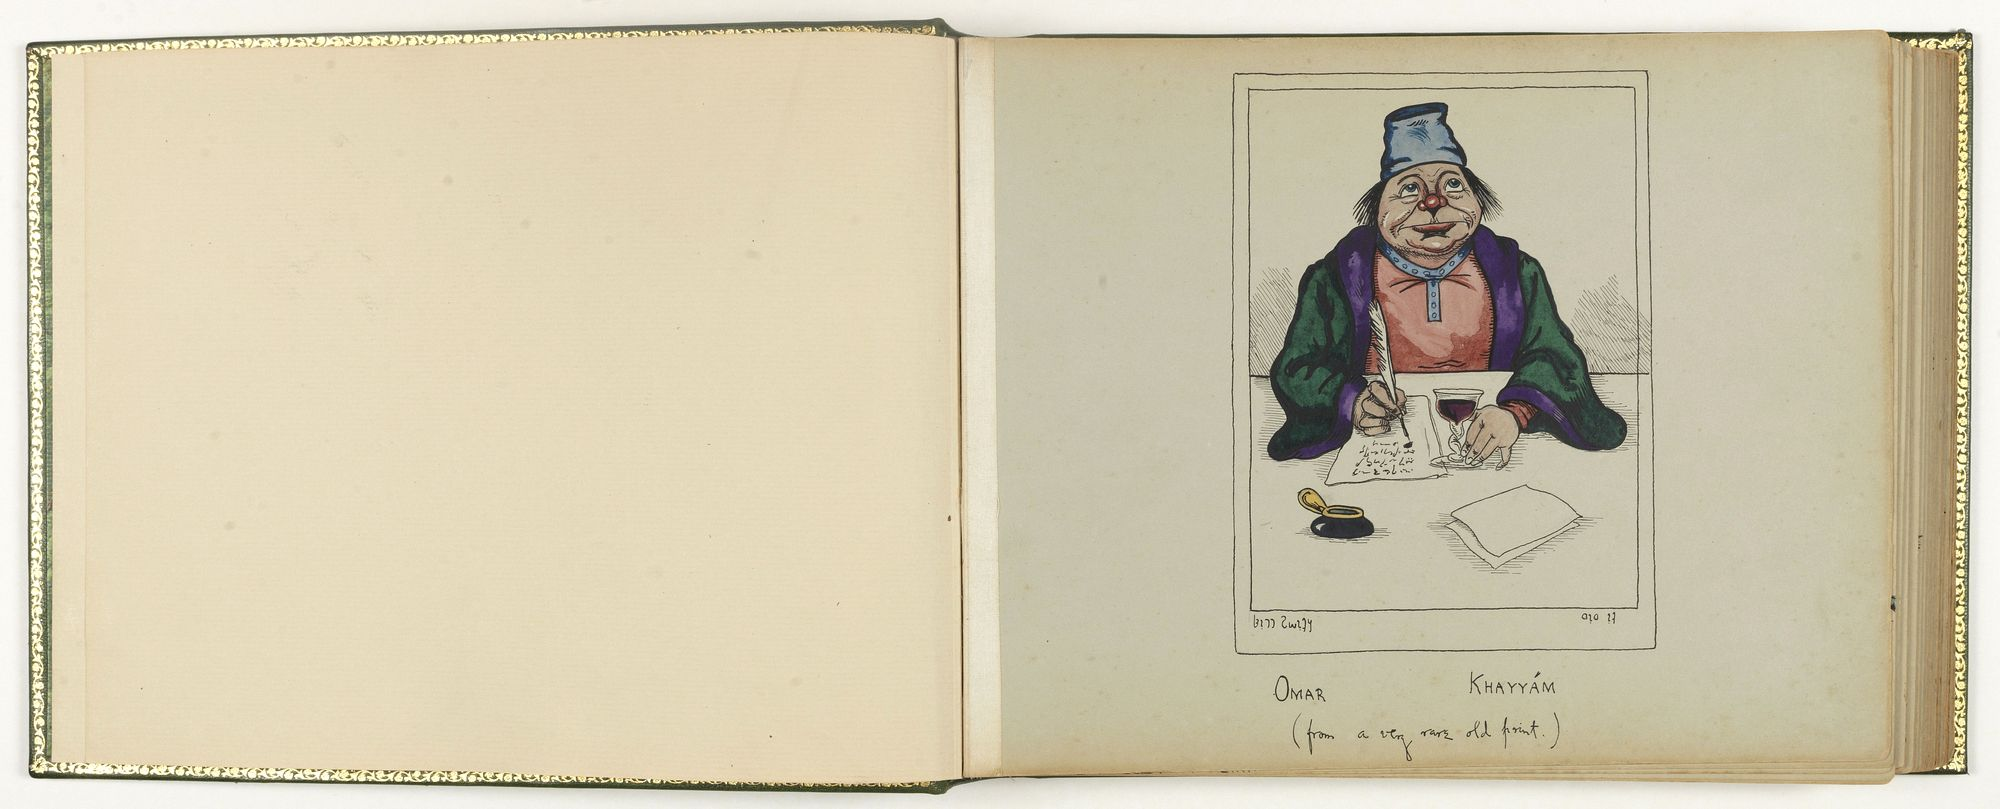 SMITH, B. -  The Rubaiyat of Omar Khayyam (Edward Fitzgerald translation)